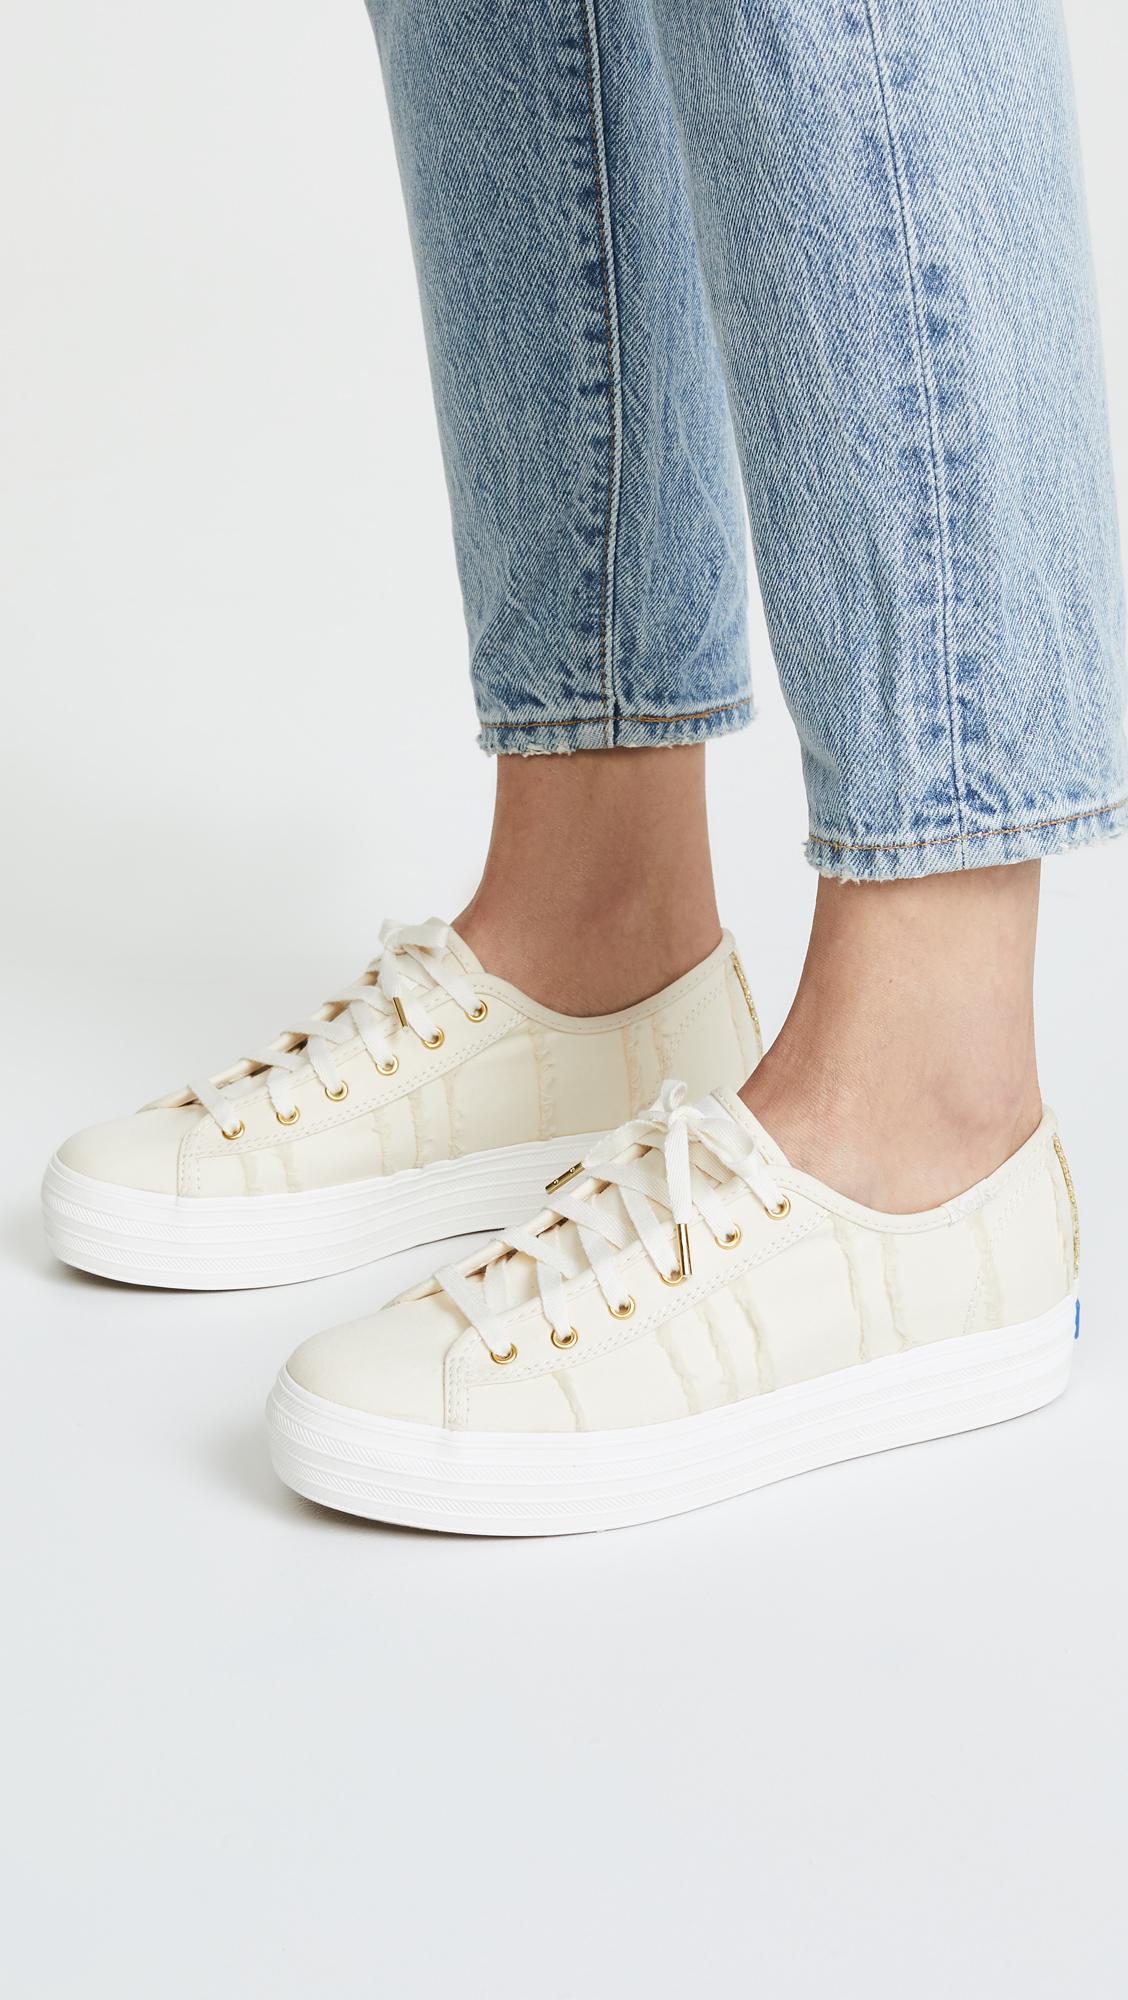 5cc75db69c6bc Keds Triple Kick Eyelash Lace Up Sneakers